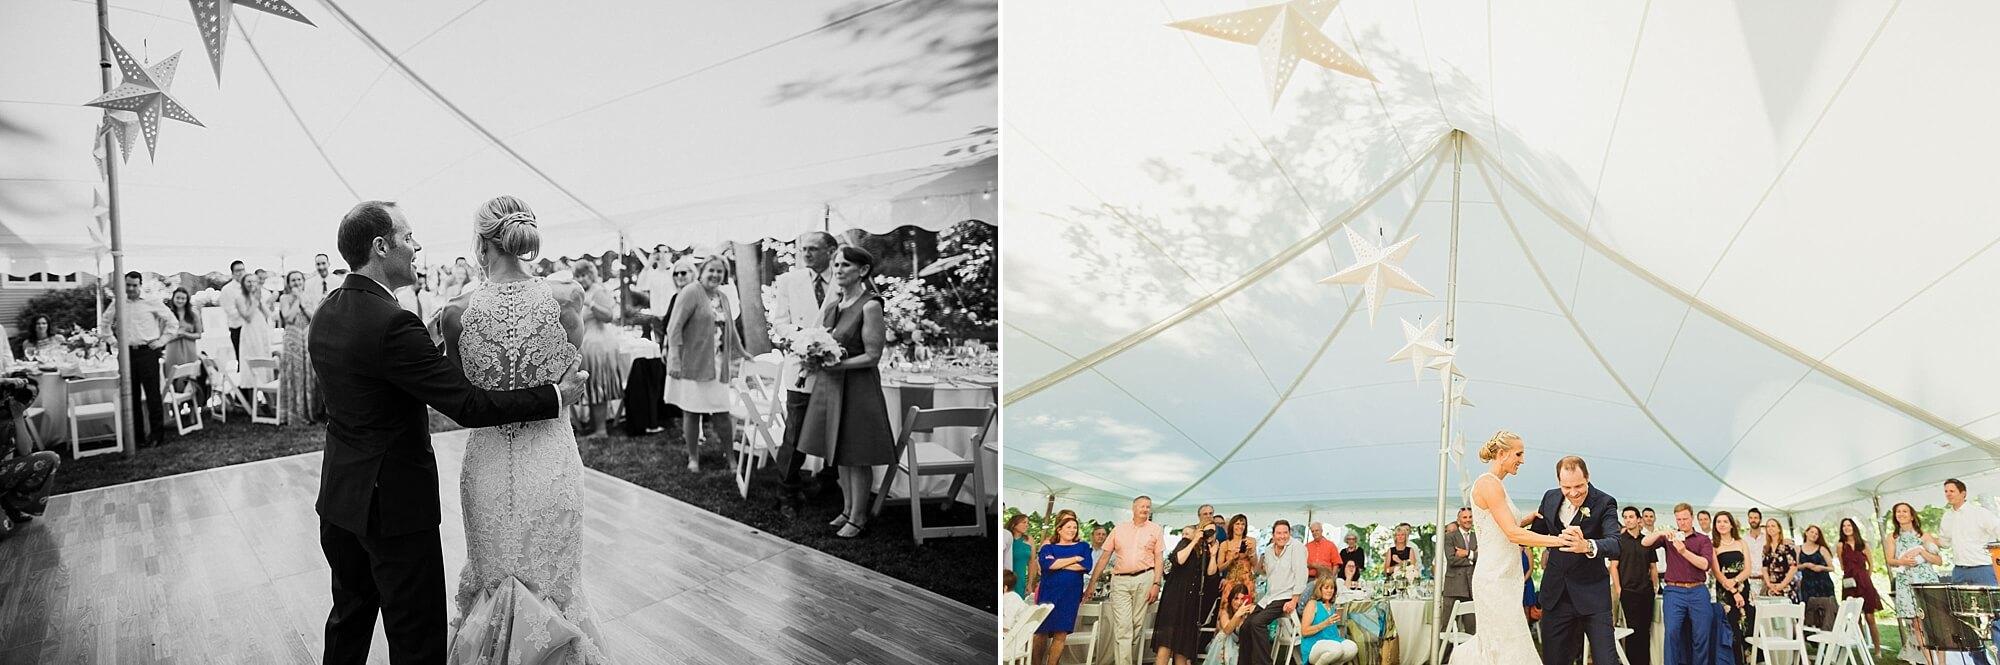 Backyard Wedding - MA_0059.jpg